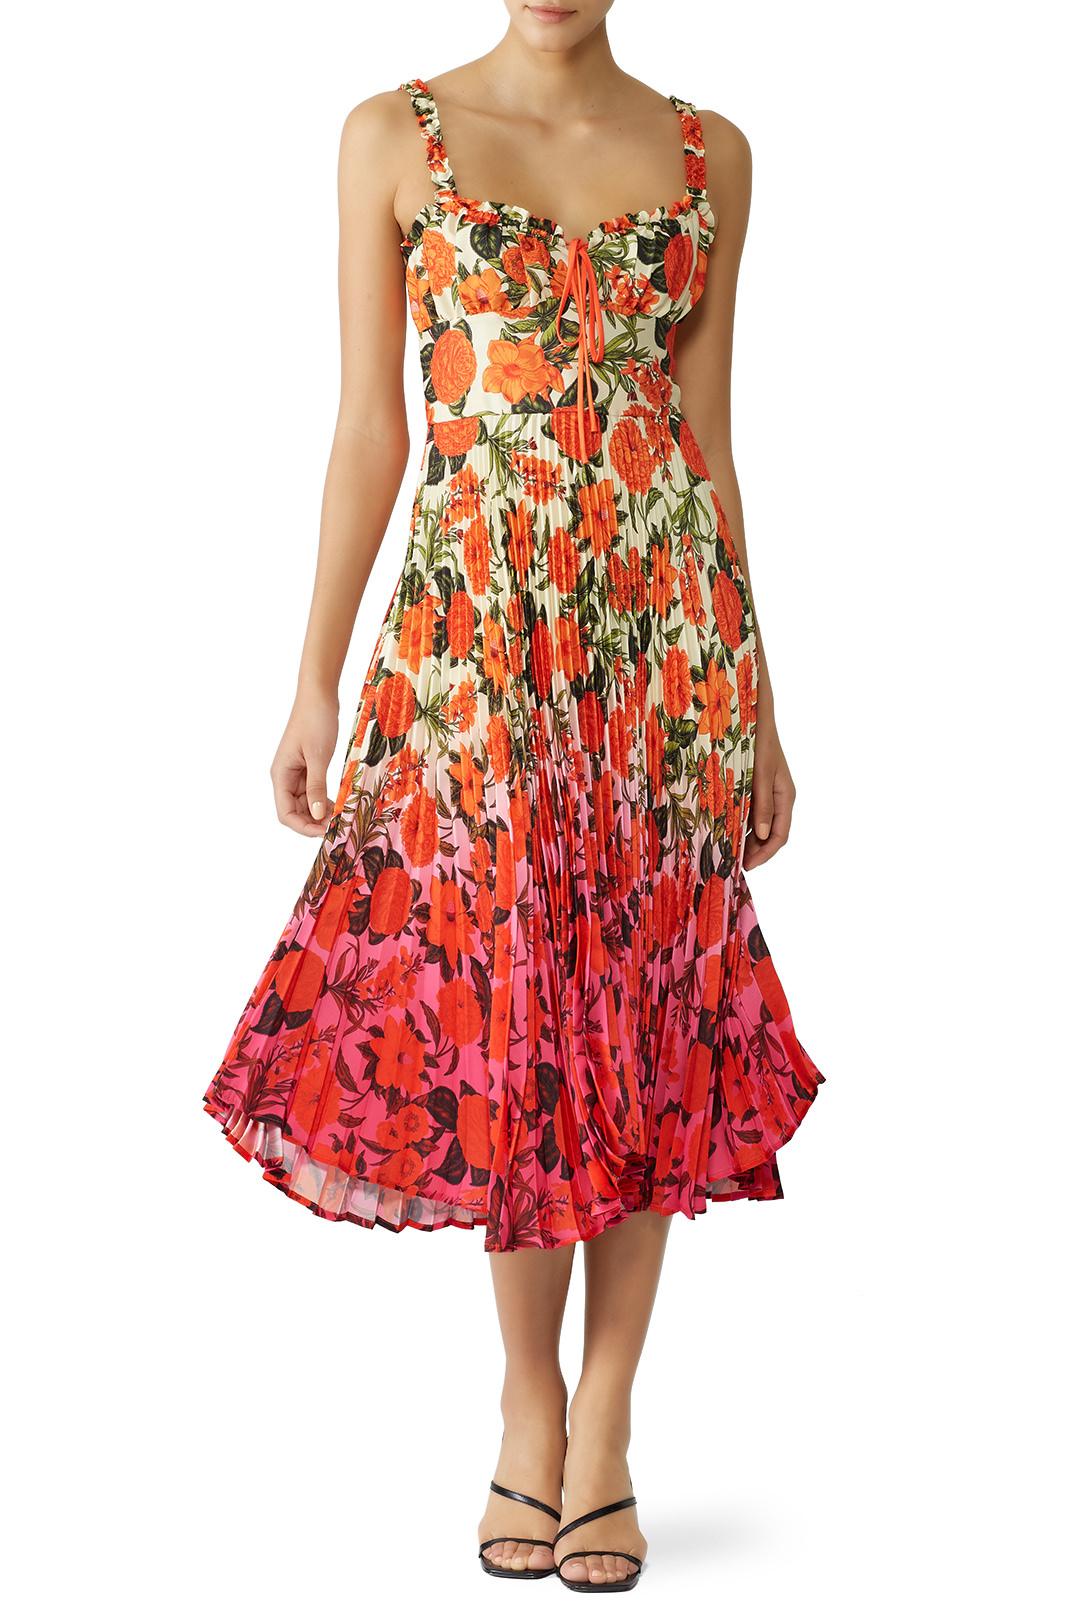 DELFI Collective - Ombre Amora Dress